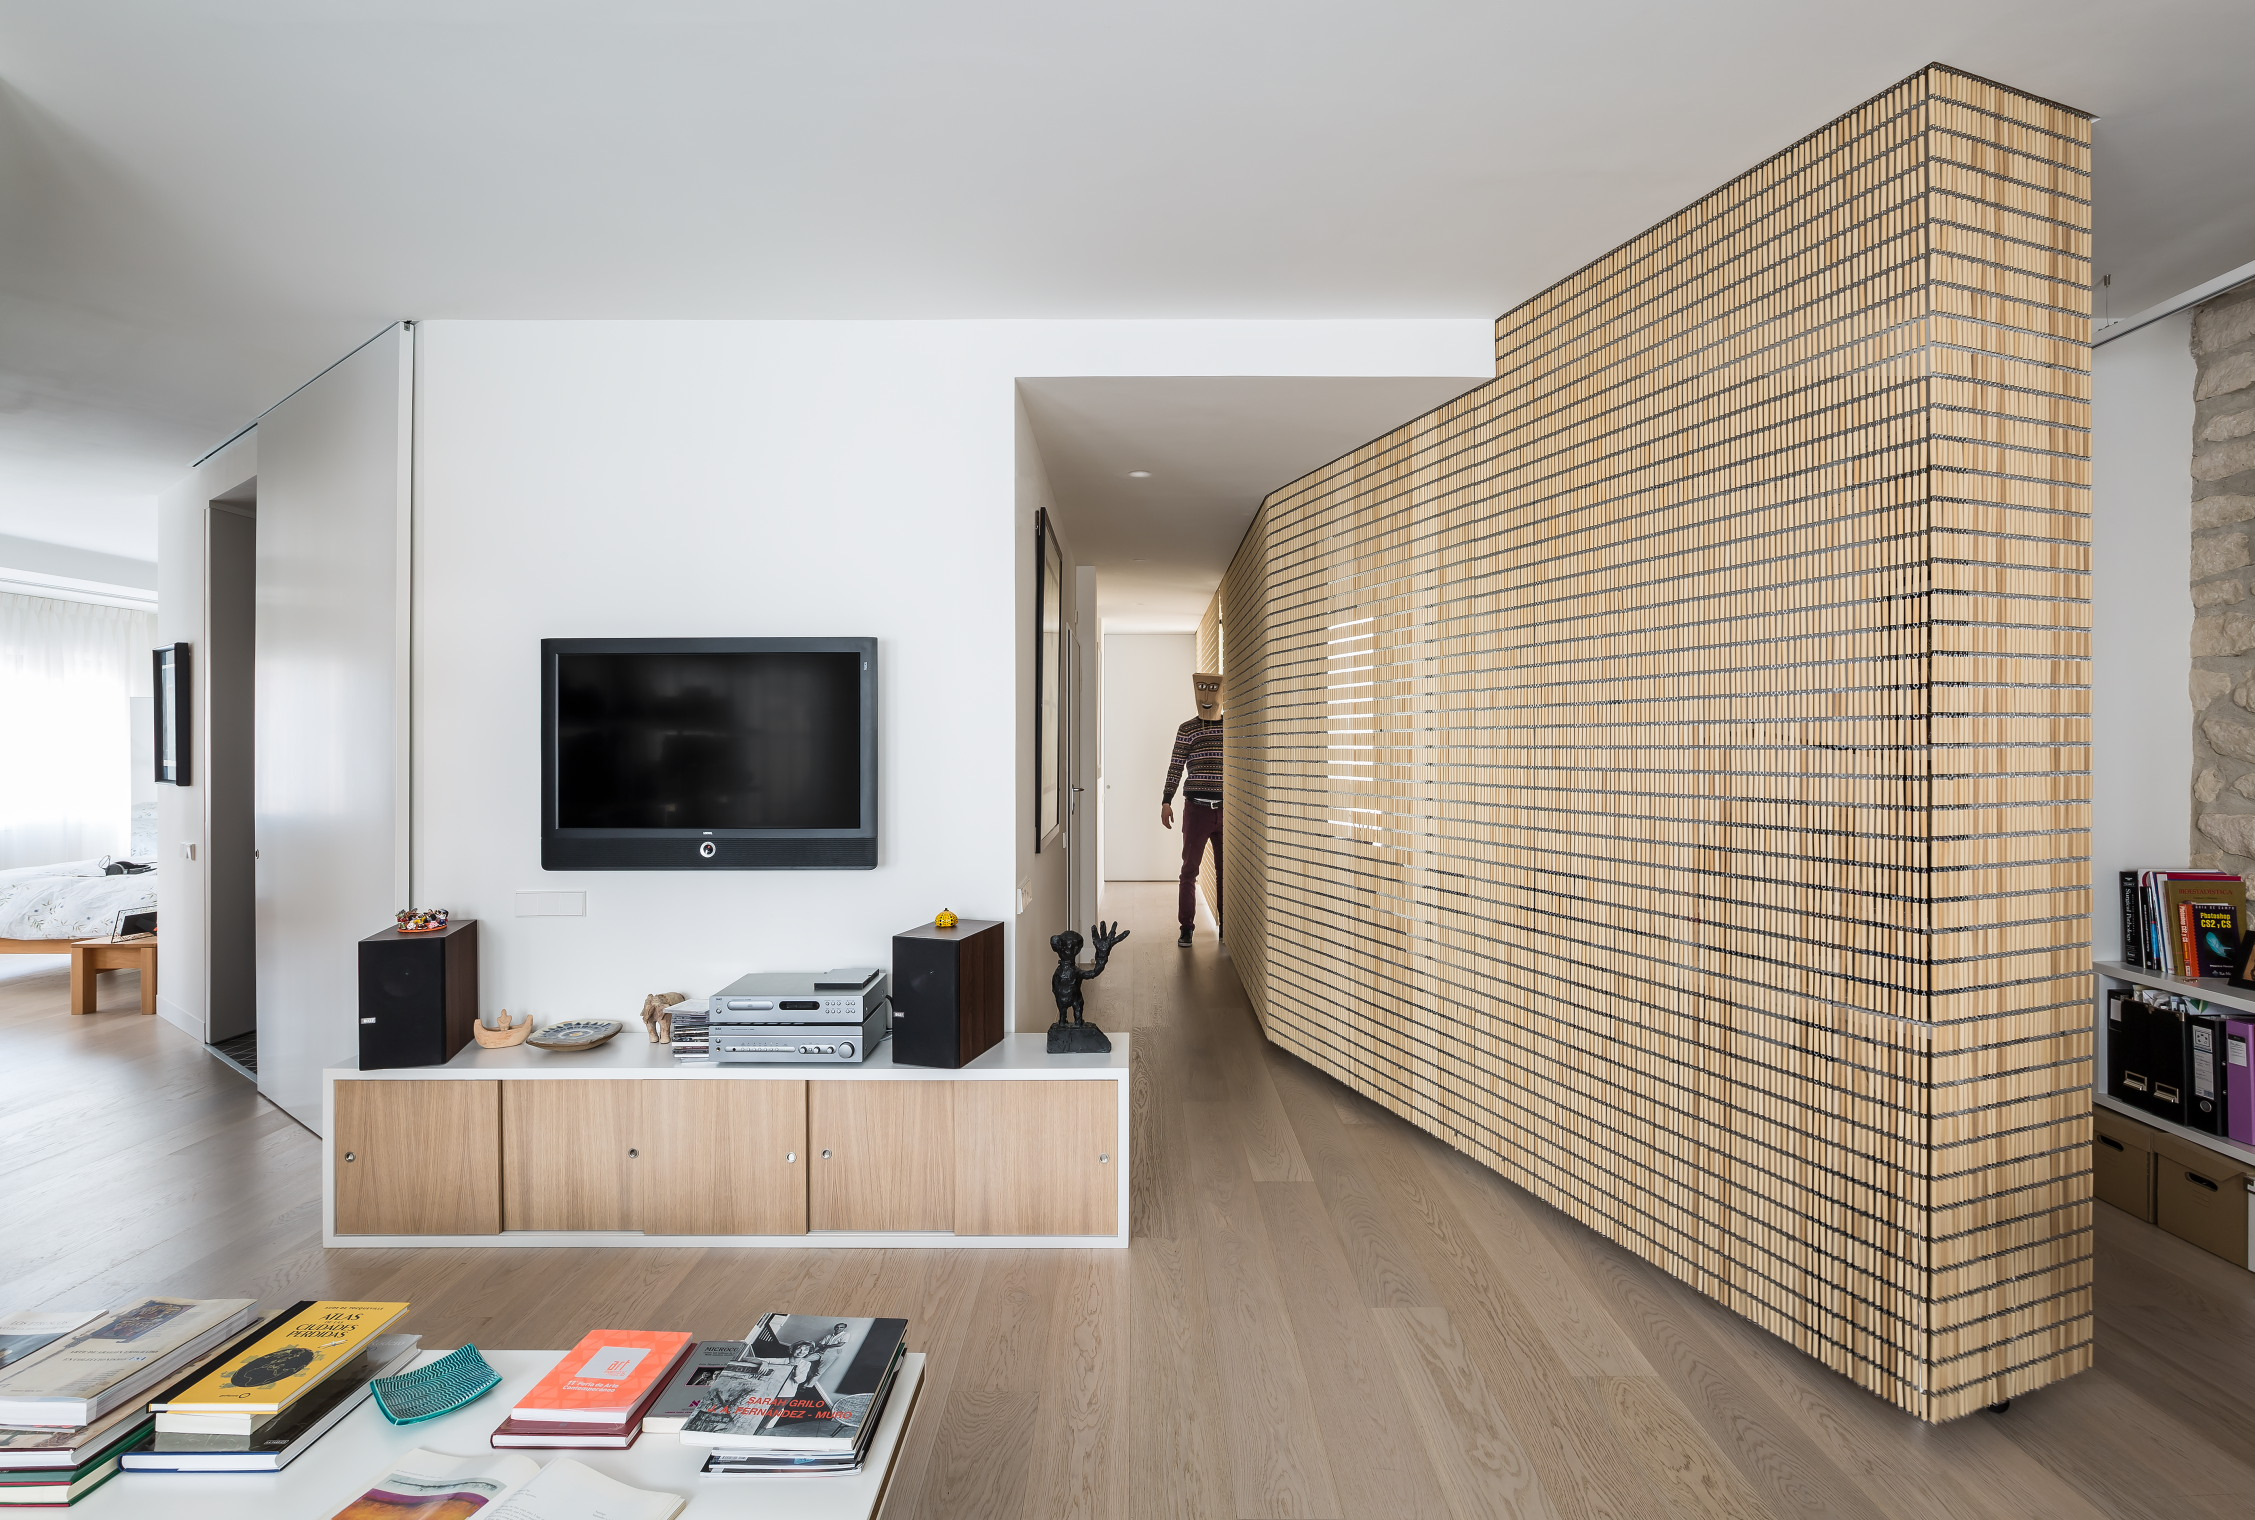 selecta_arquitectos valencia Joaquin Juberias